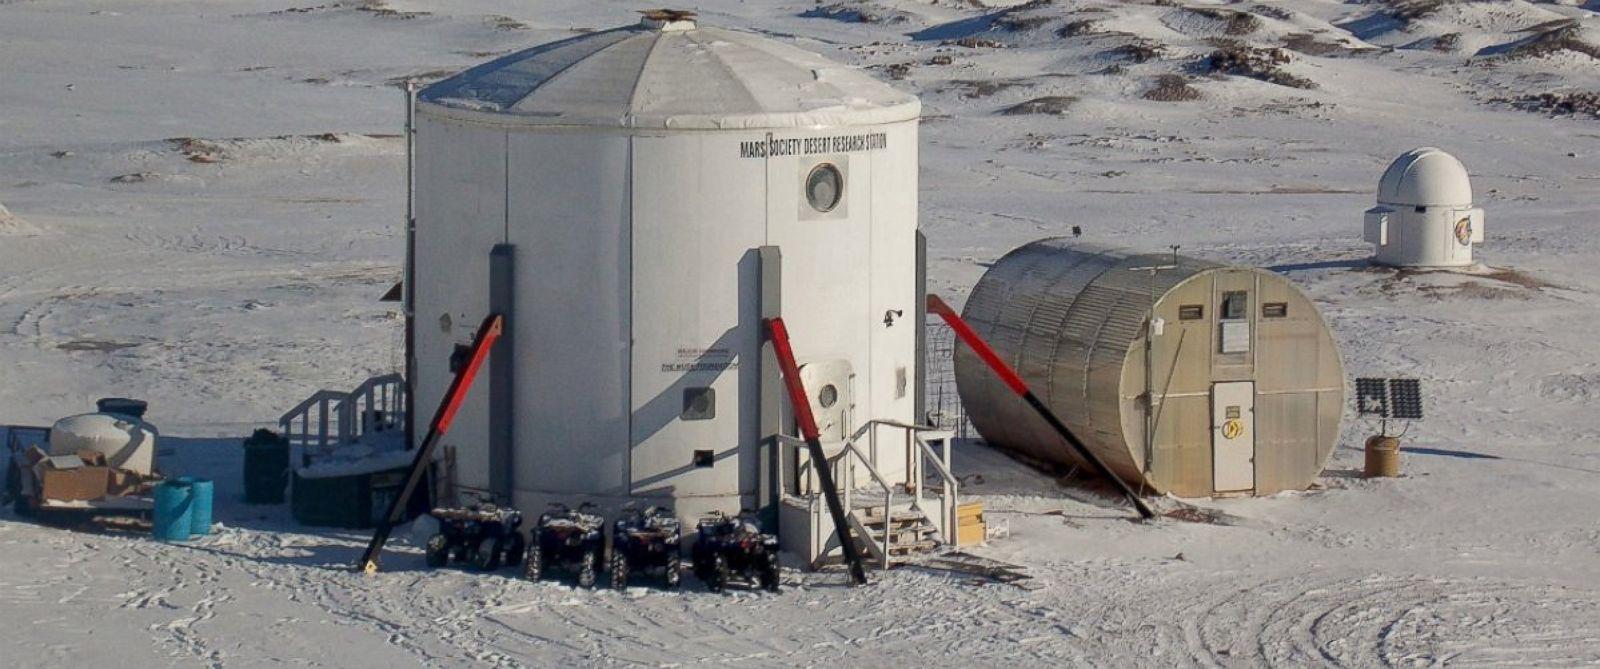 PHOTO: The Mars Mission Desert Research Station in Hanksville, Utah.